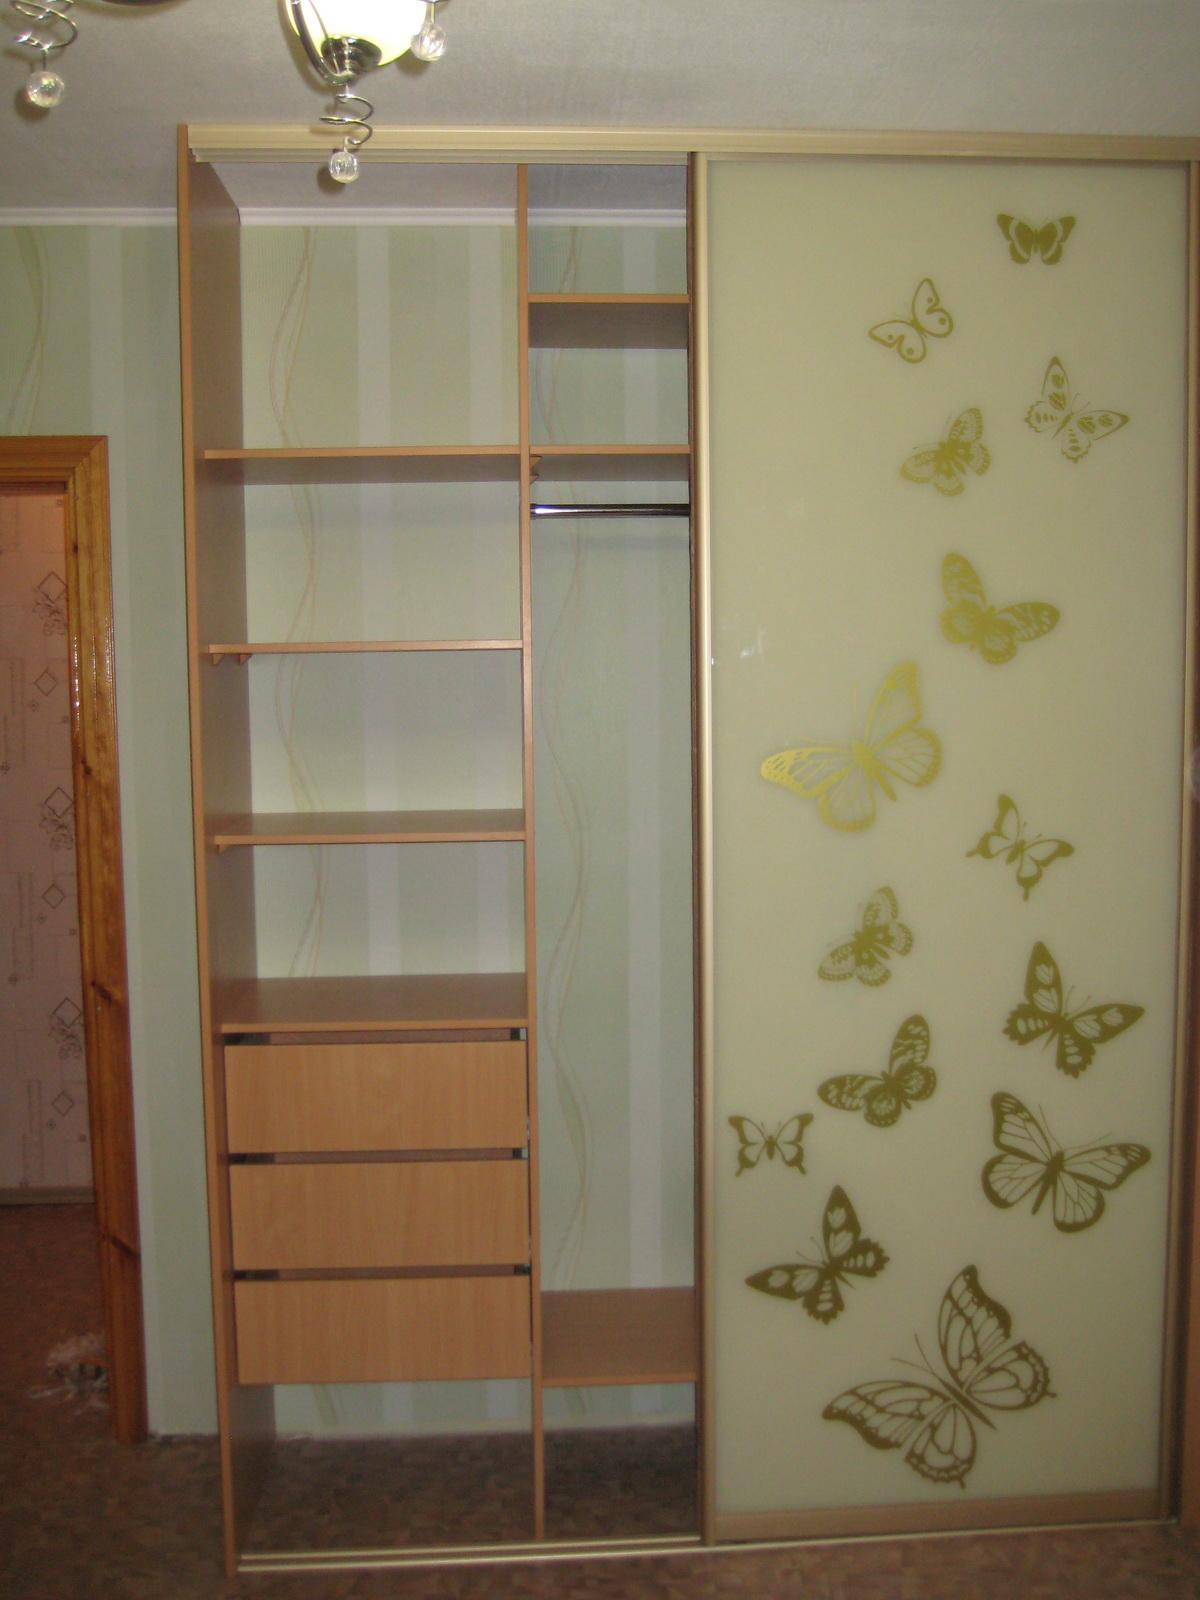 мебель шкафы купе недорого наро-фоминский район